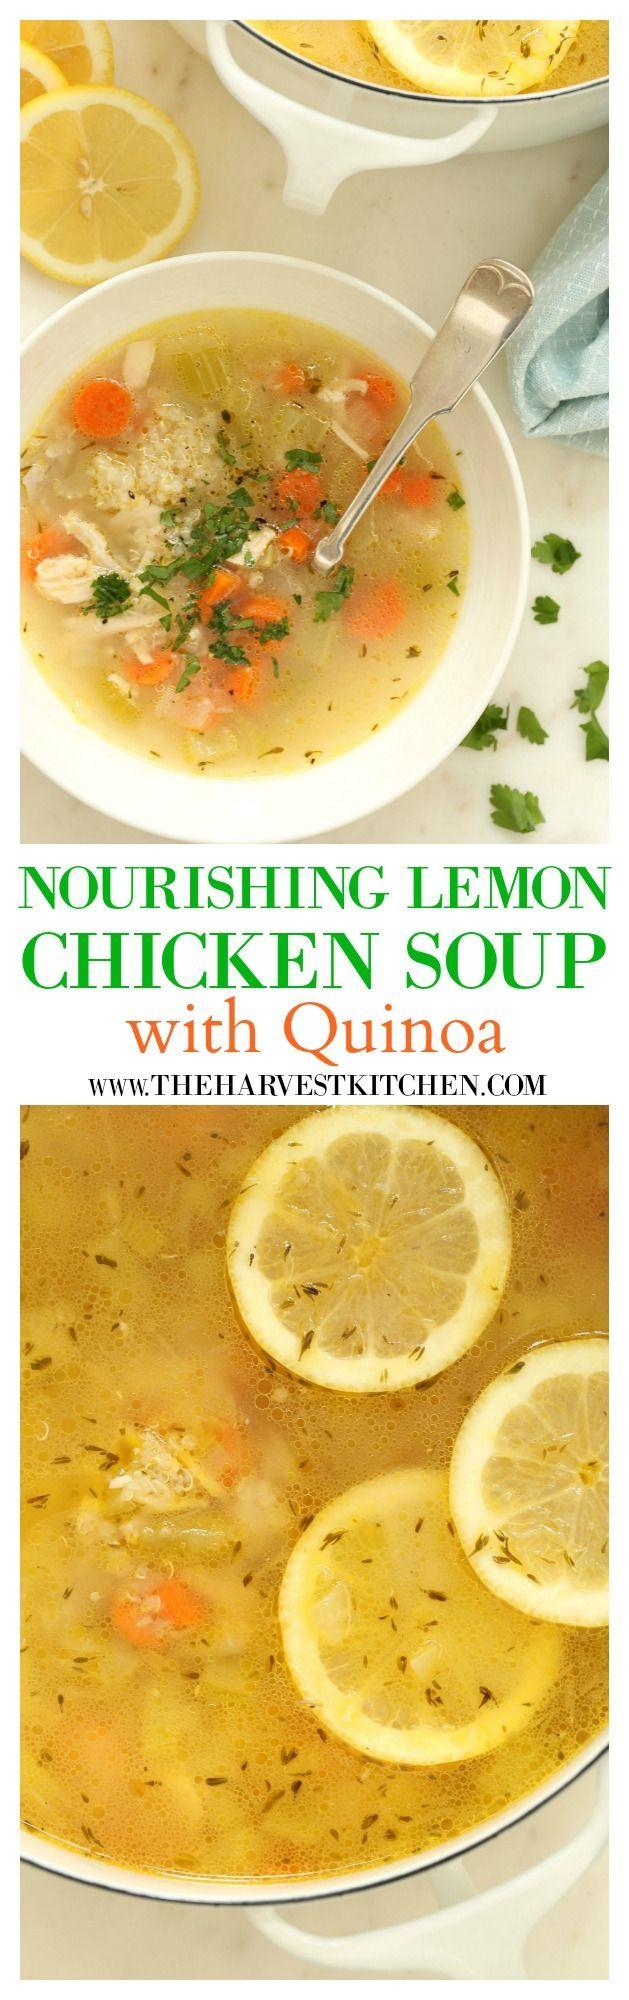 Nourishing Lemon Chicken + Quinoa Soup